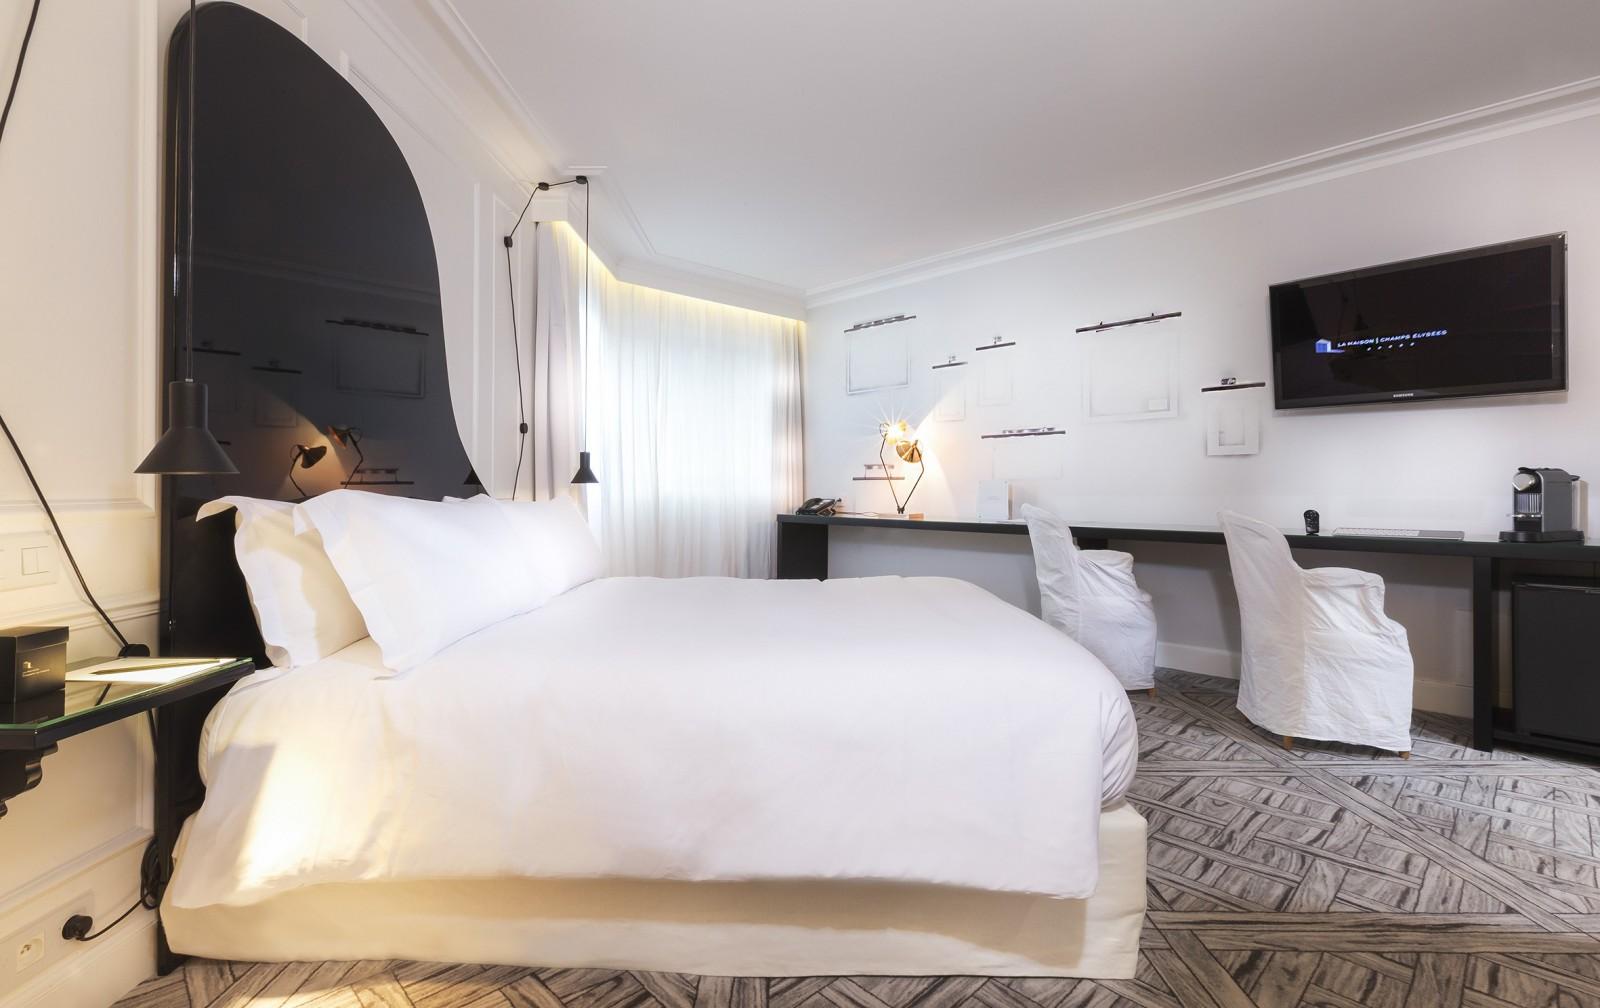 Maison Margiela Hotel Paris